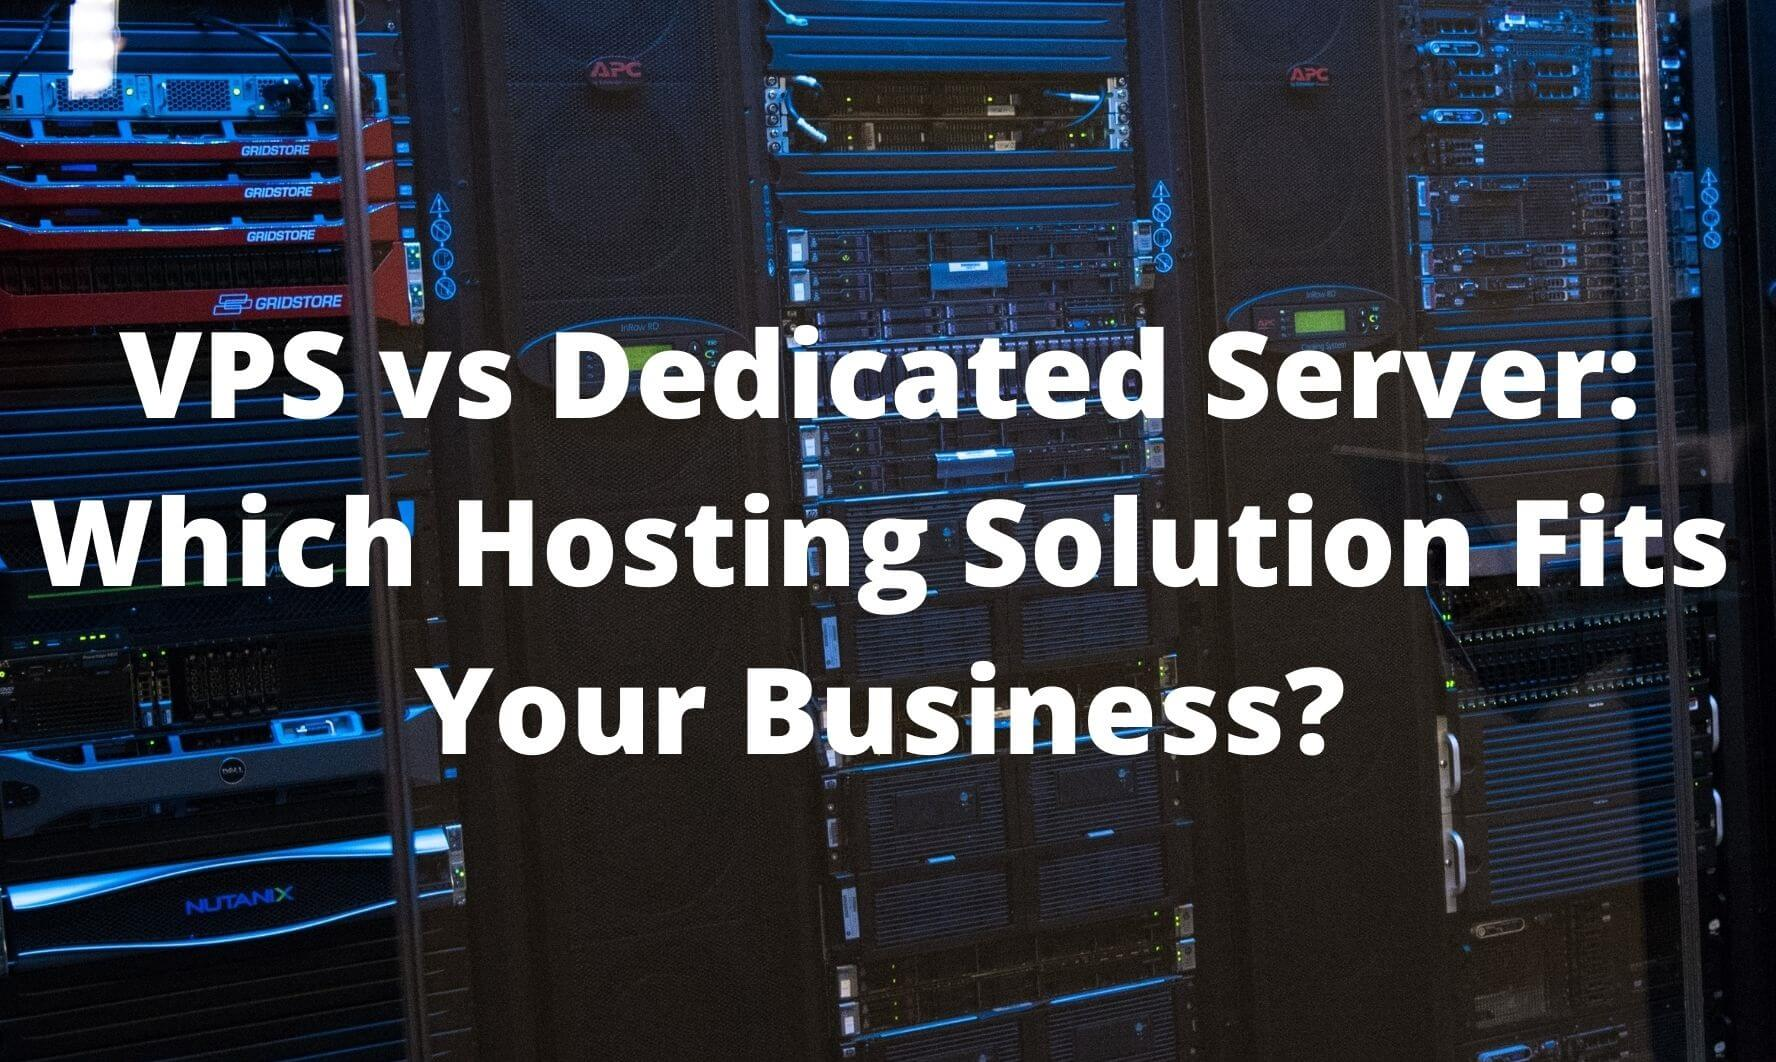 VPS-vs-Dedicated-Server-1-1